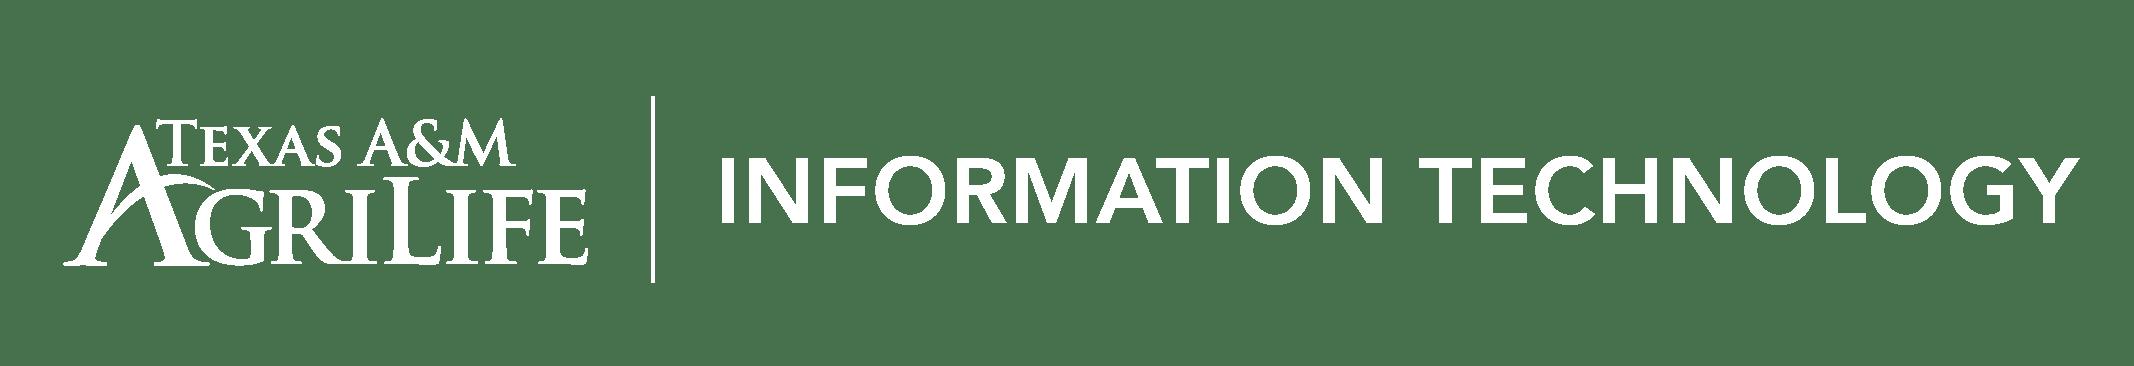 IT_Horizontal - DarkBG